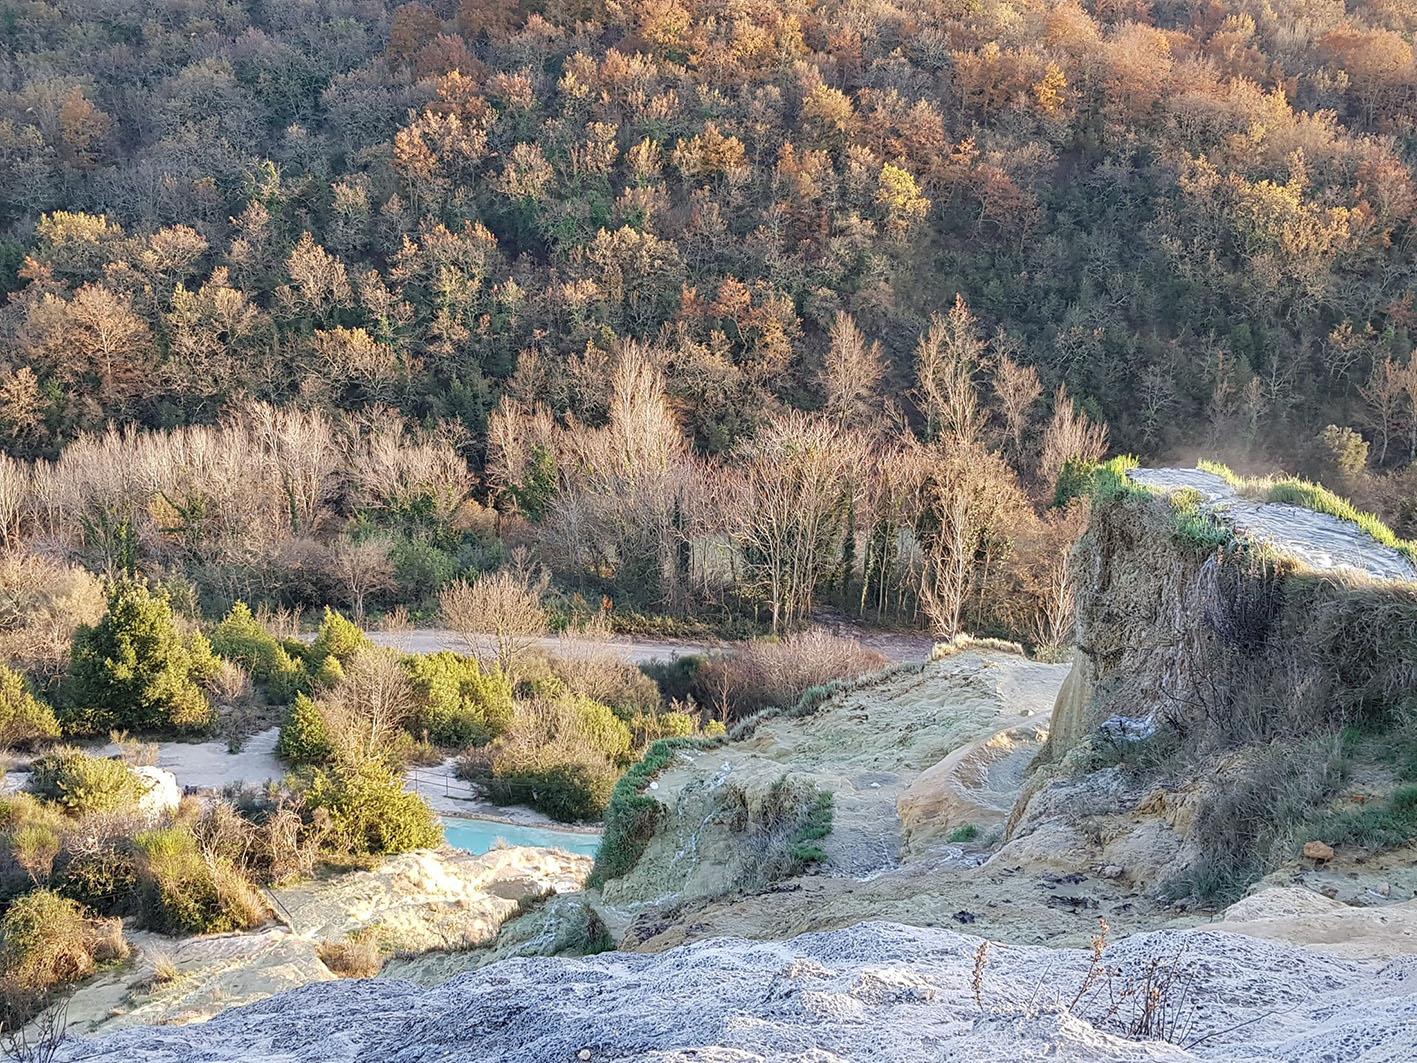 http://www.viaggiavventurenelmondo.it/immagini/umbriatrek1.jpg